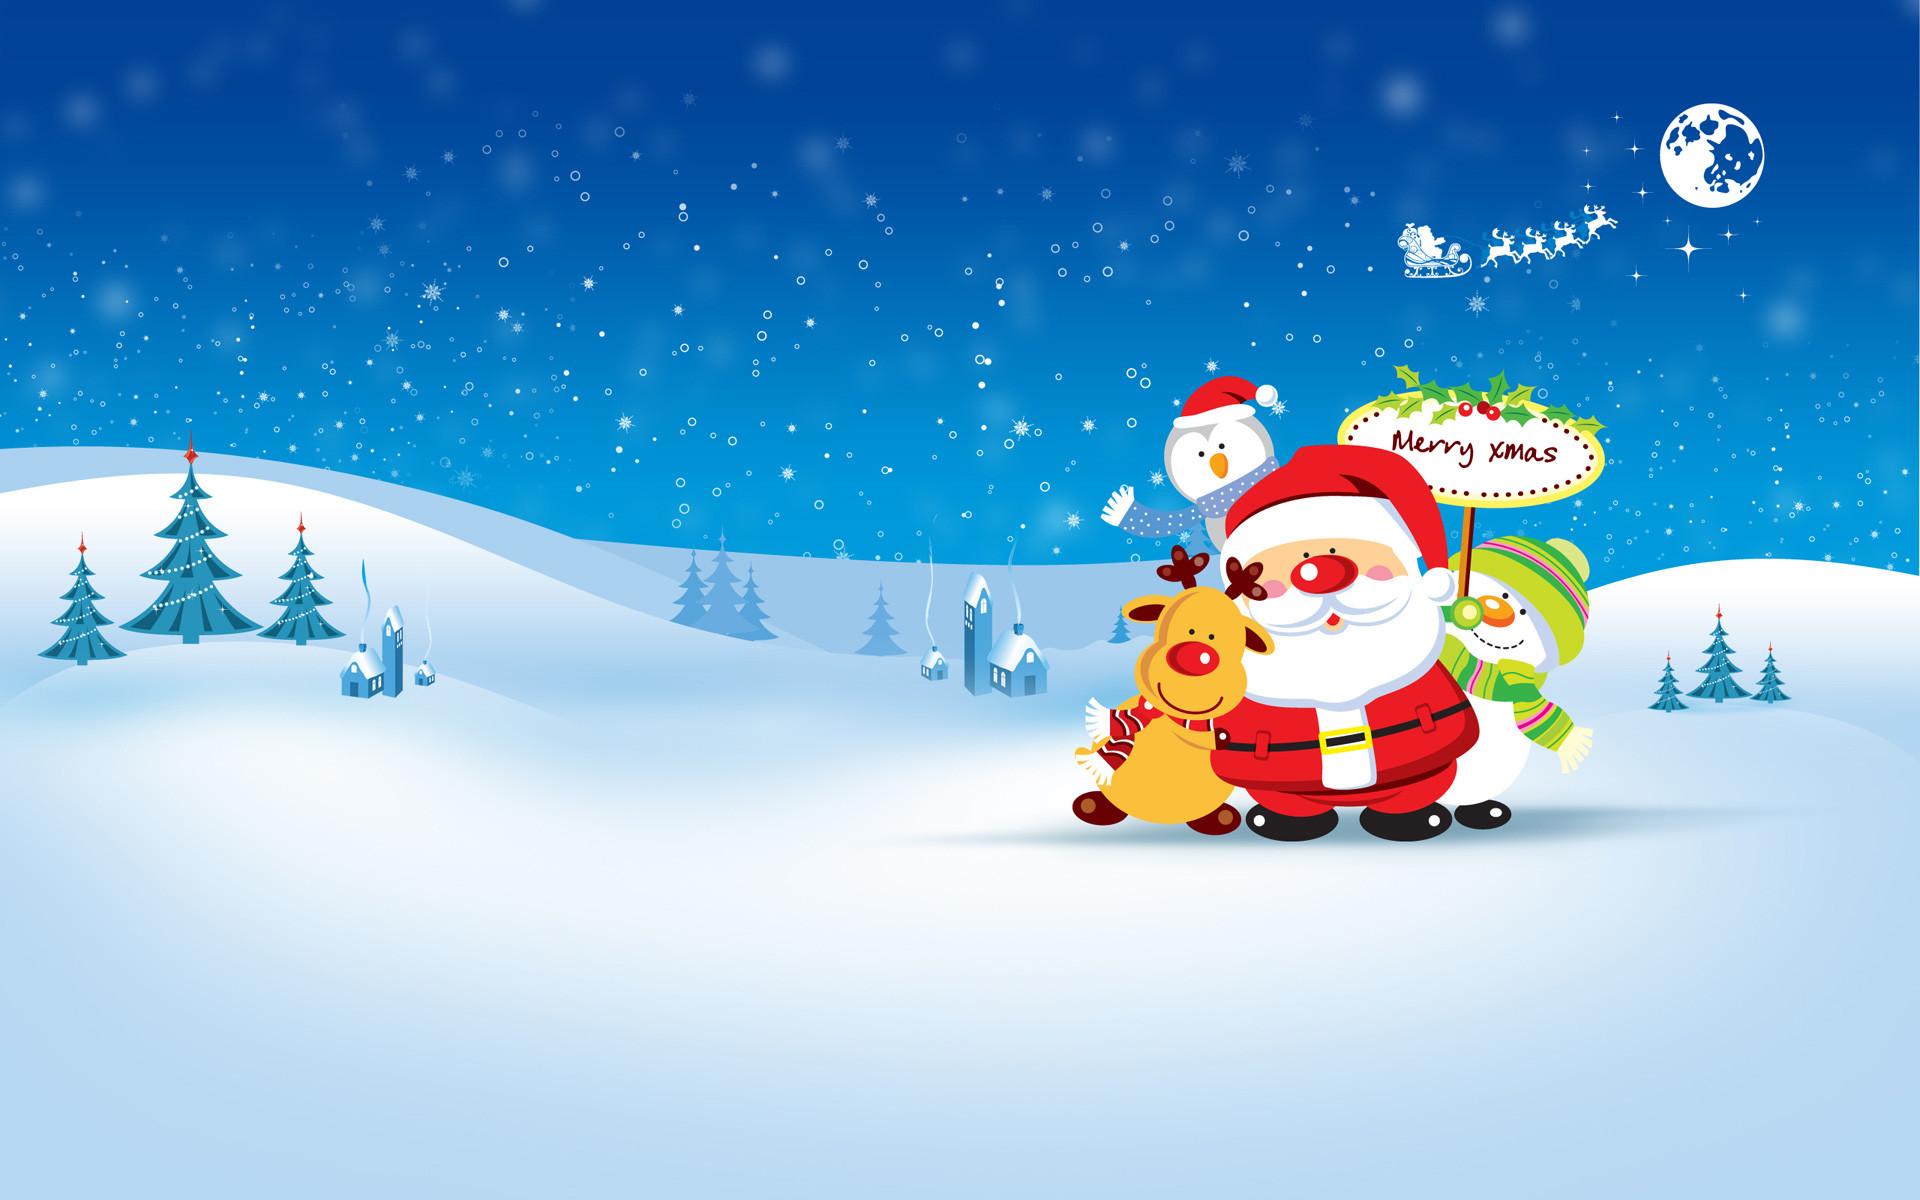 desktop wallpaper winter christmas – www.wallpapers-in-hd.com